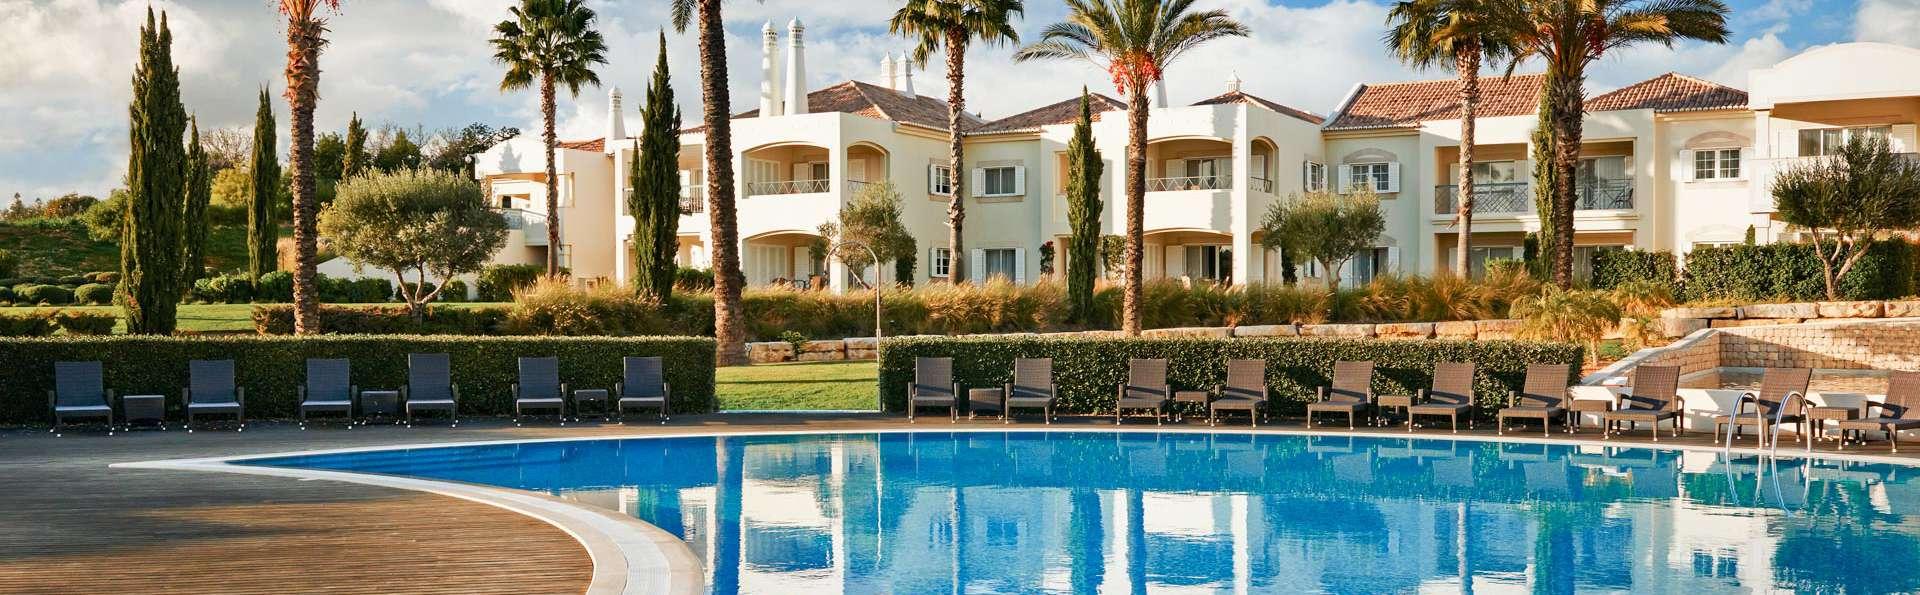 Vale d'Oliveiras Quinta Resort & Spa - EDIT_POOL_02.jpg